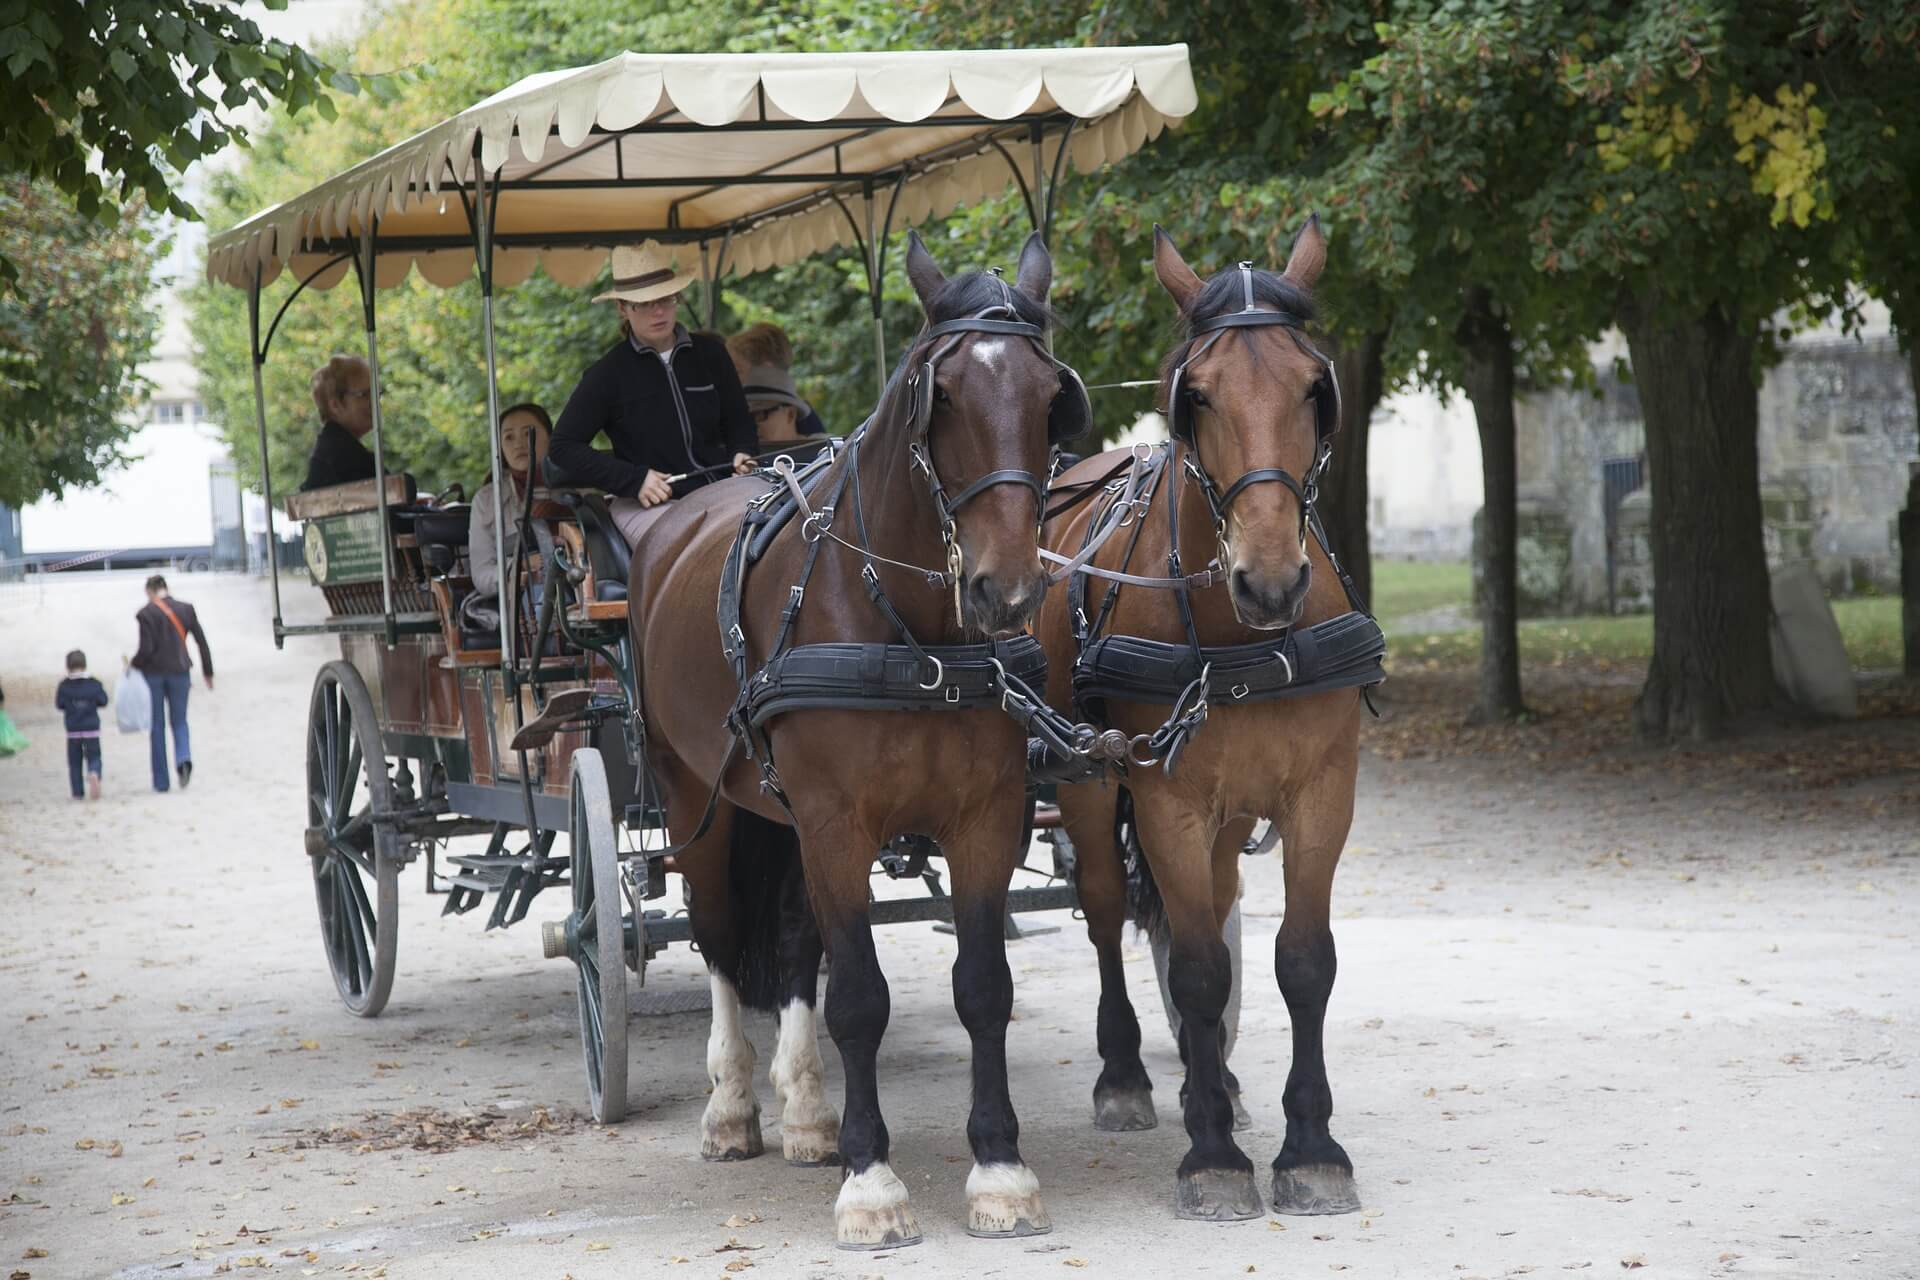 fontainebleau-726780_1920